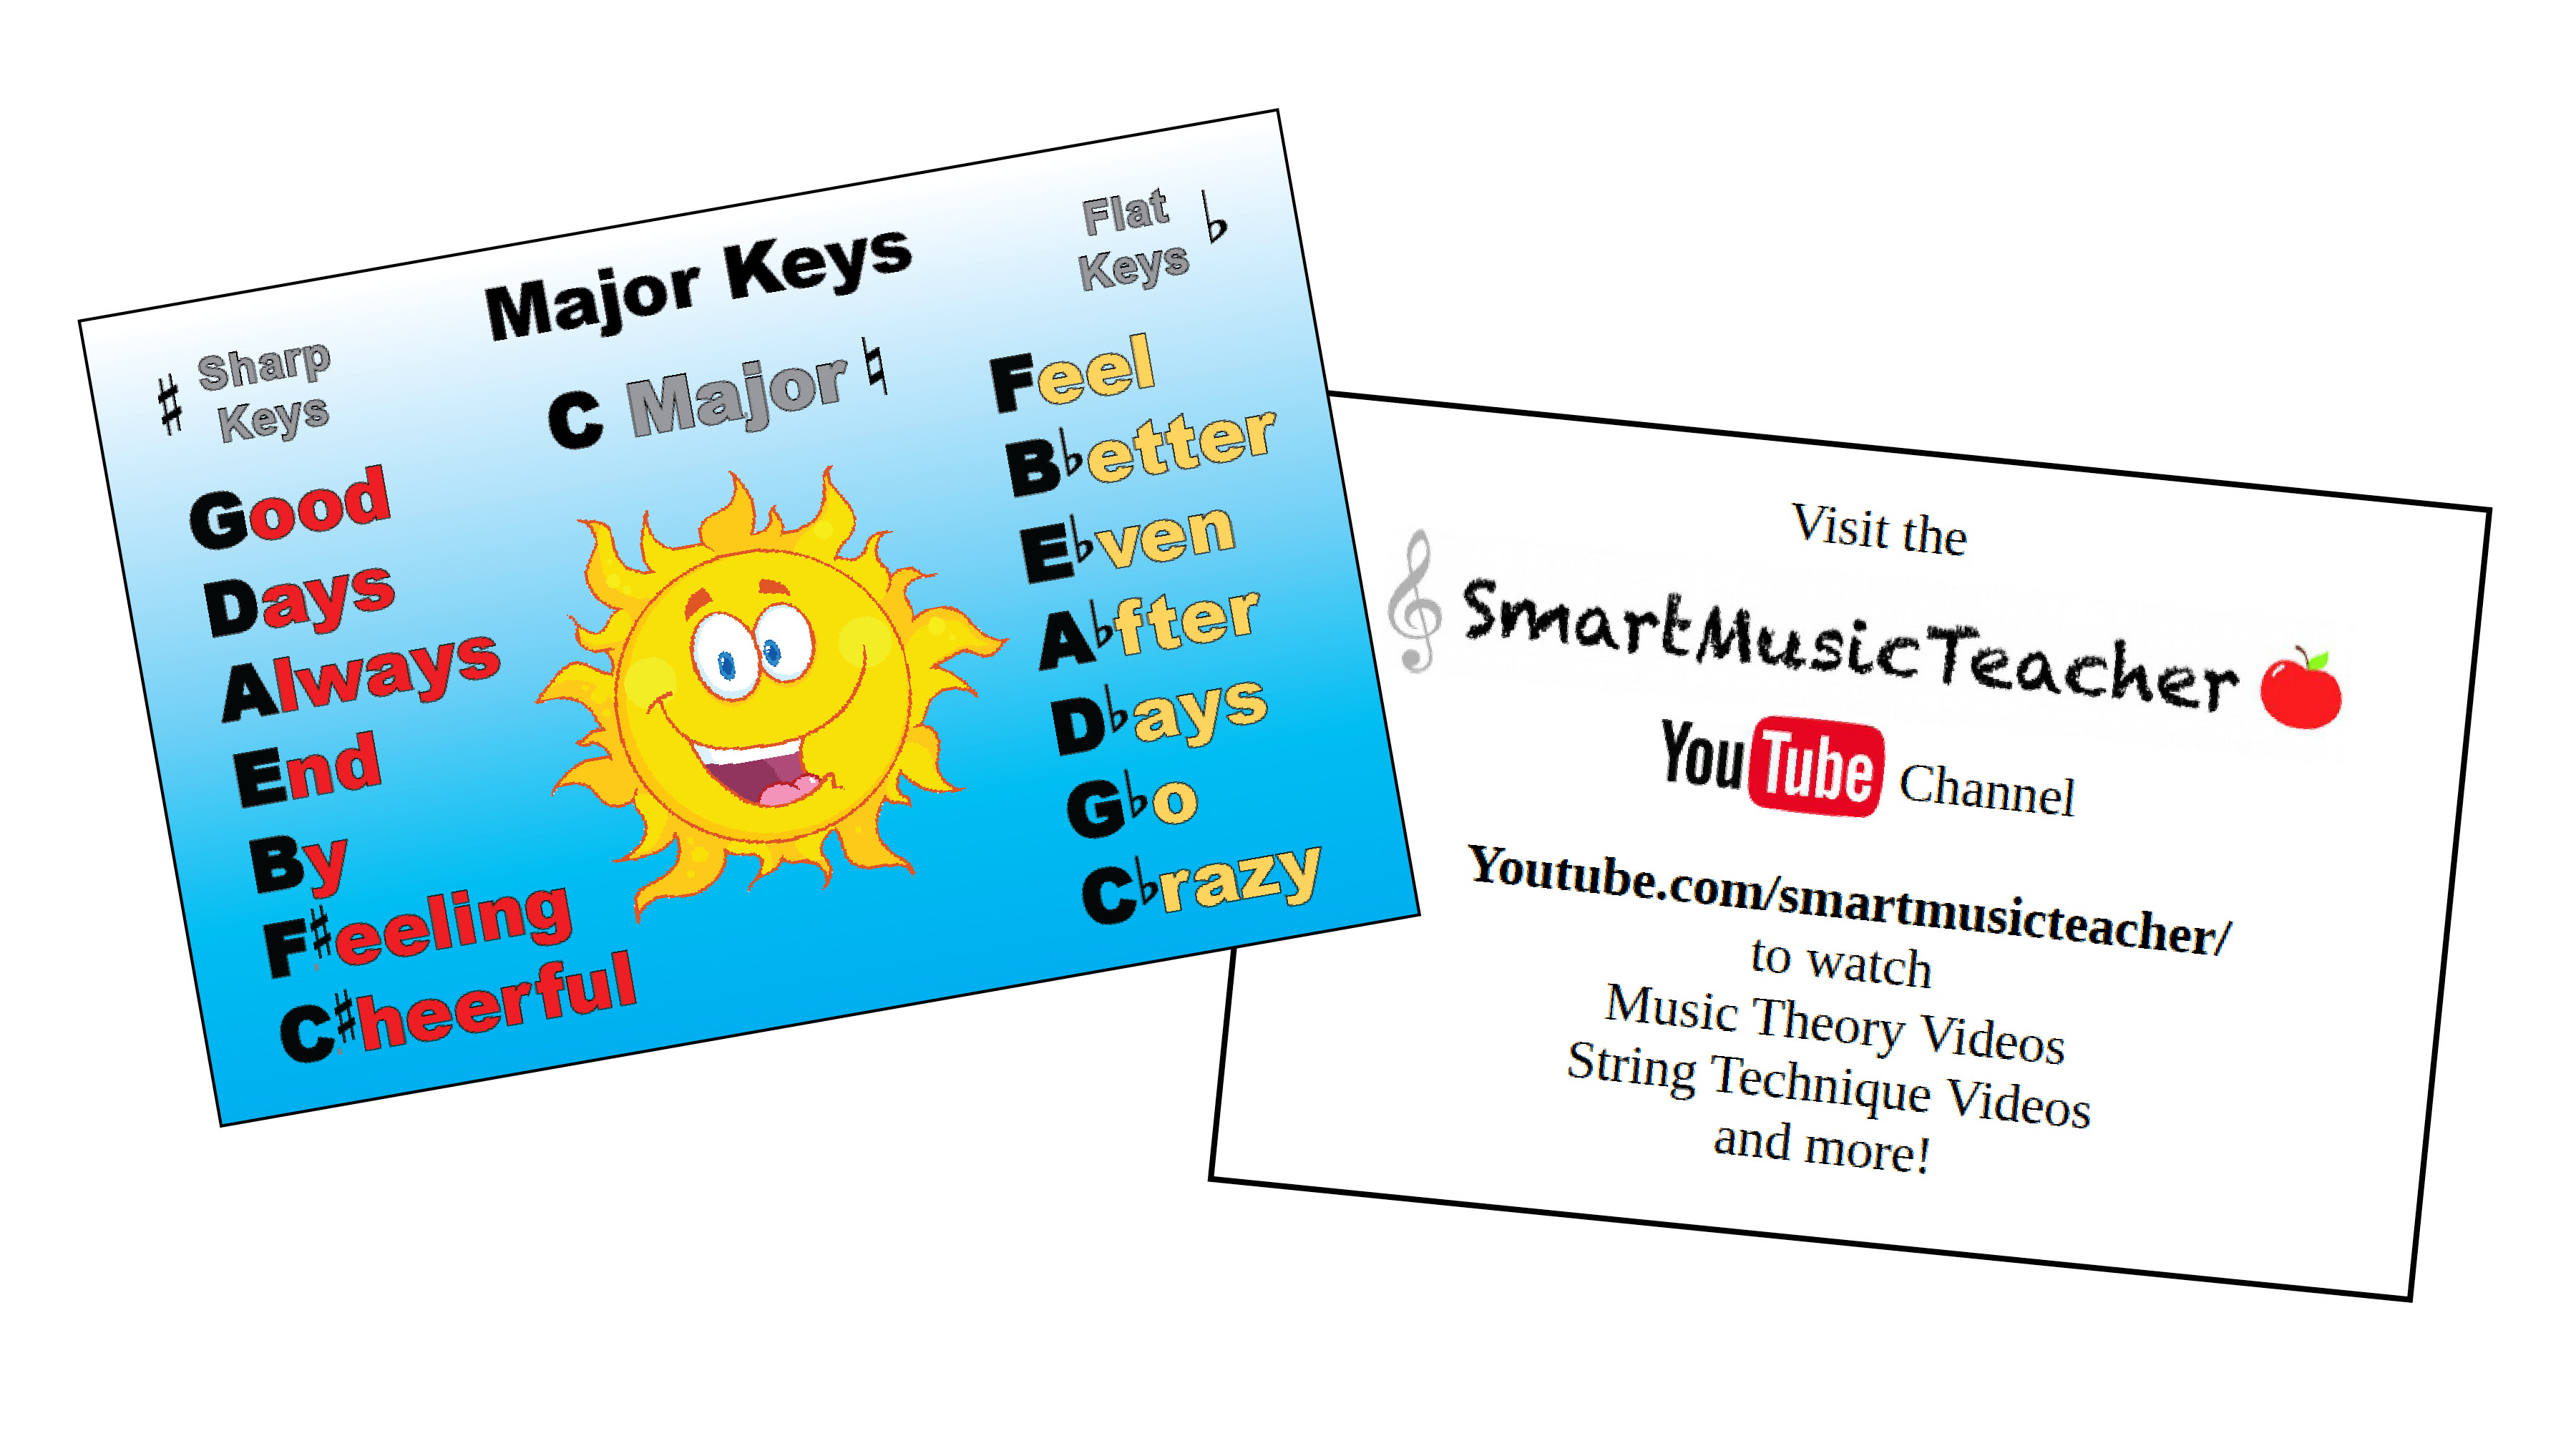 Major Keys Mnemonic